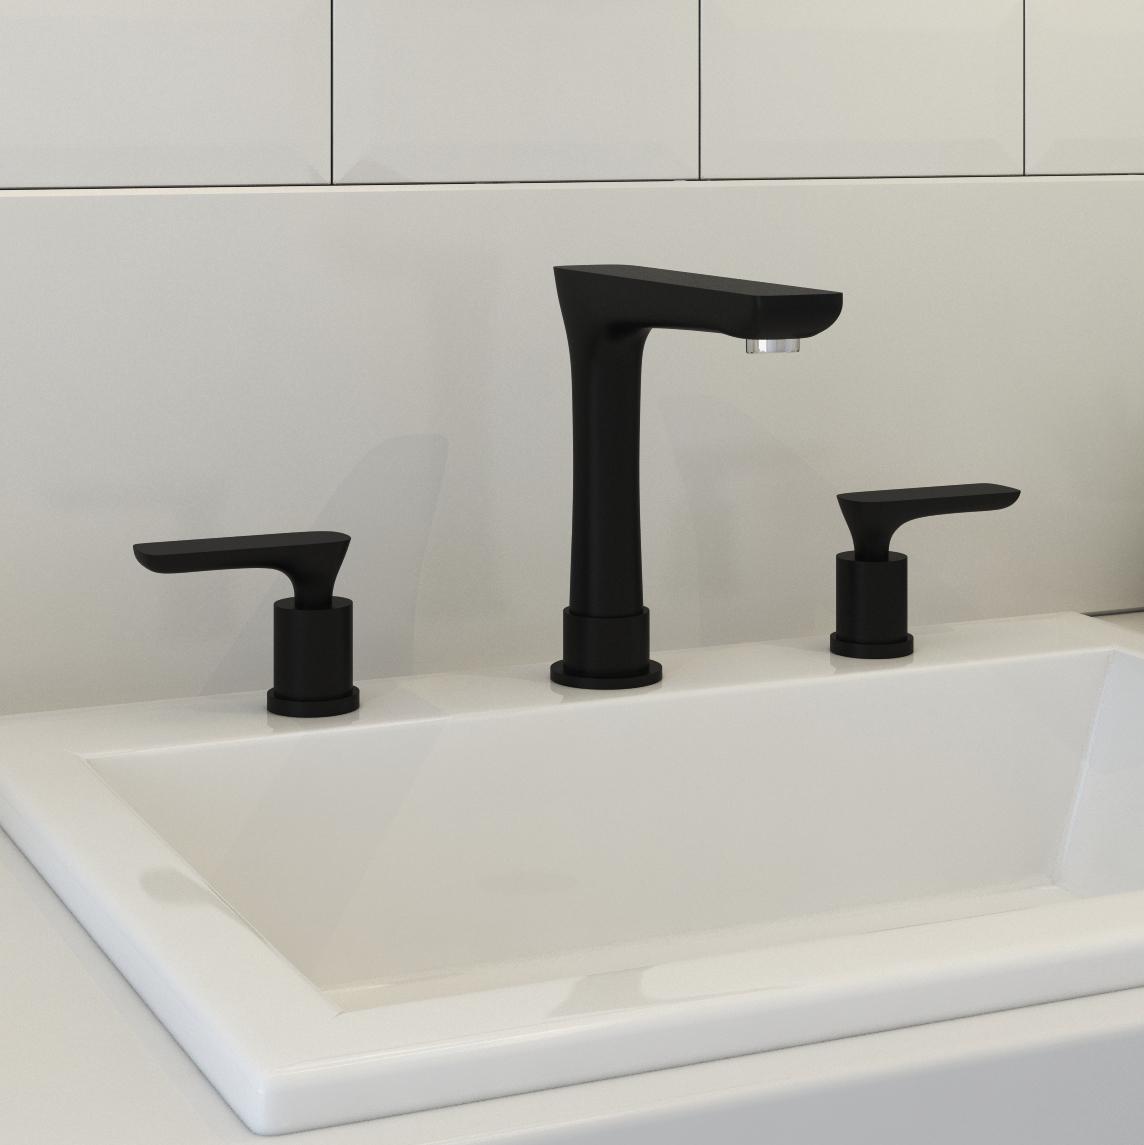 Huelva Dual Handle Oil Rubbed Bronze Bathroom Sink Faucet